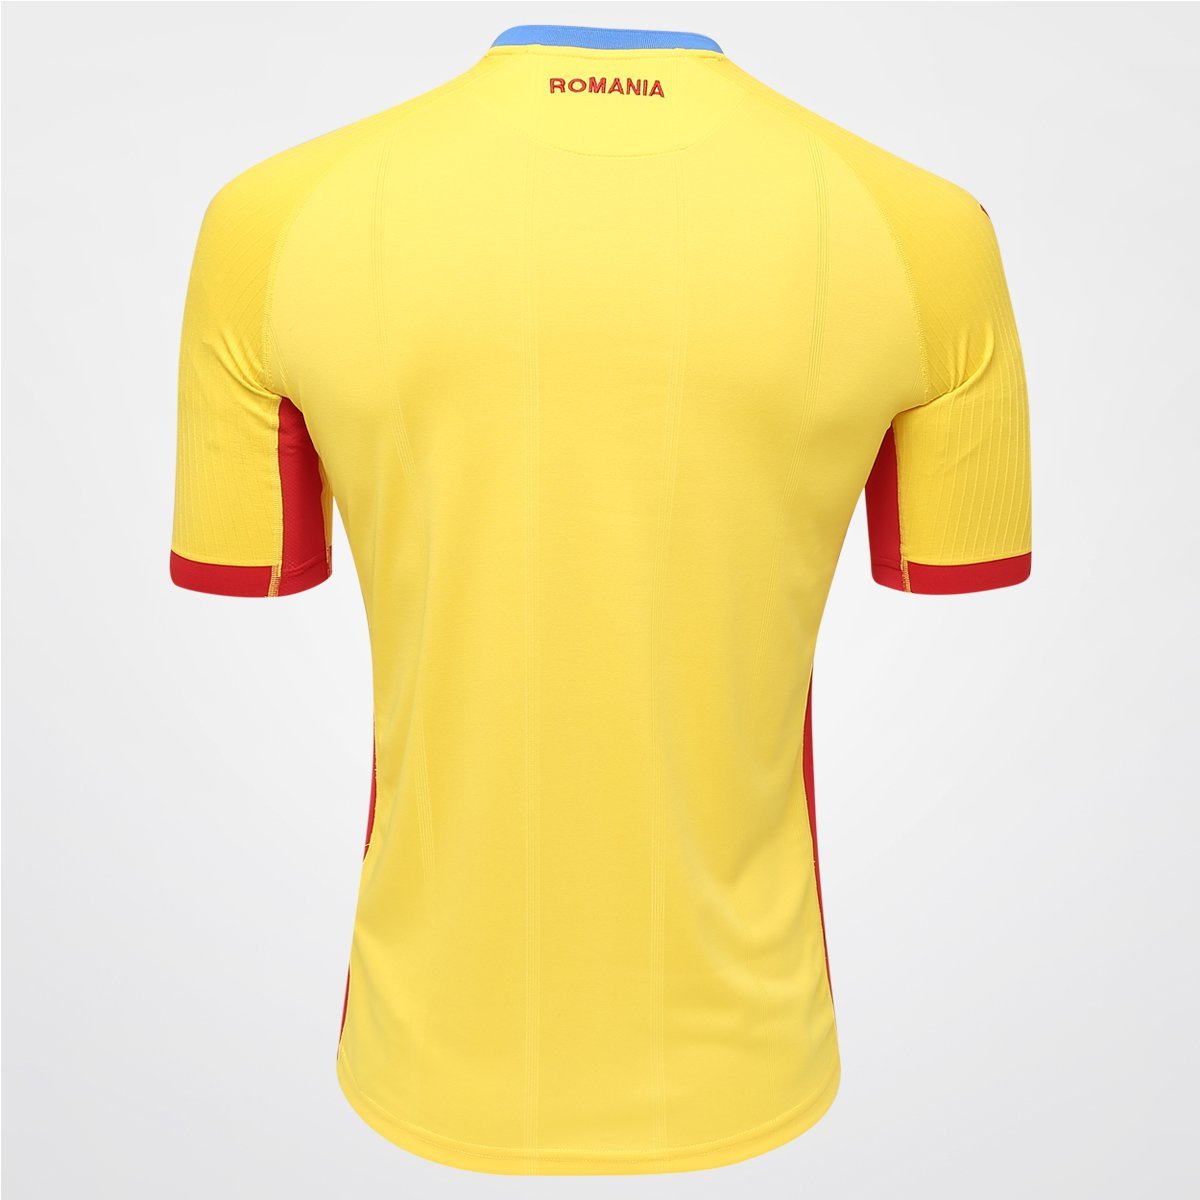 Camisa Romênia Home 15 16 s nº Torcedor Joma Masculina  e693dc48a8515